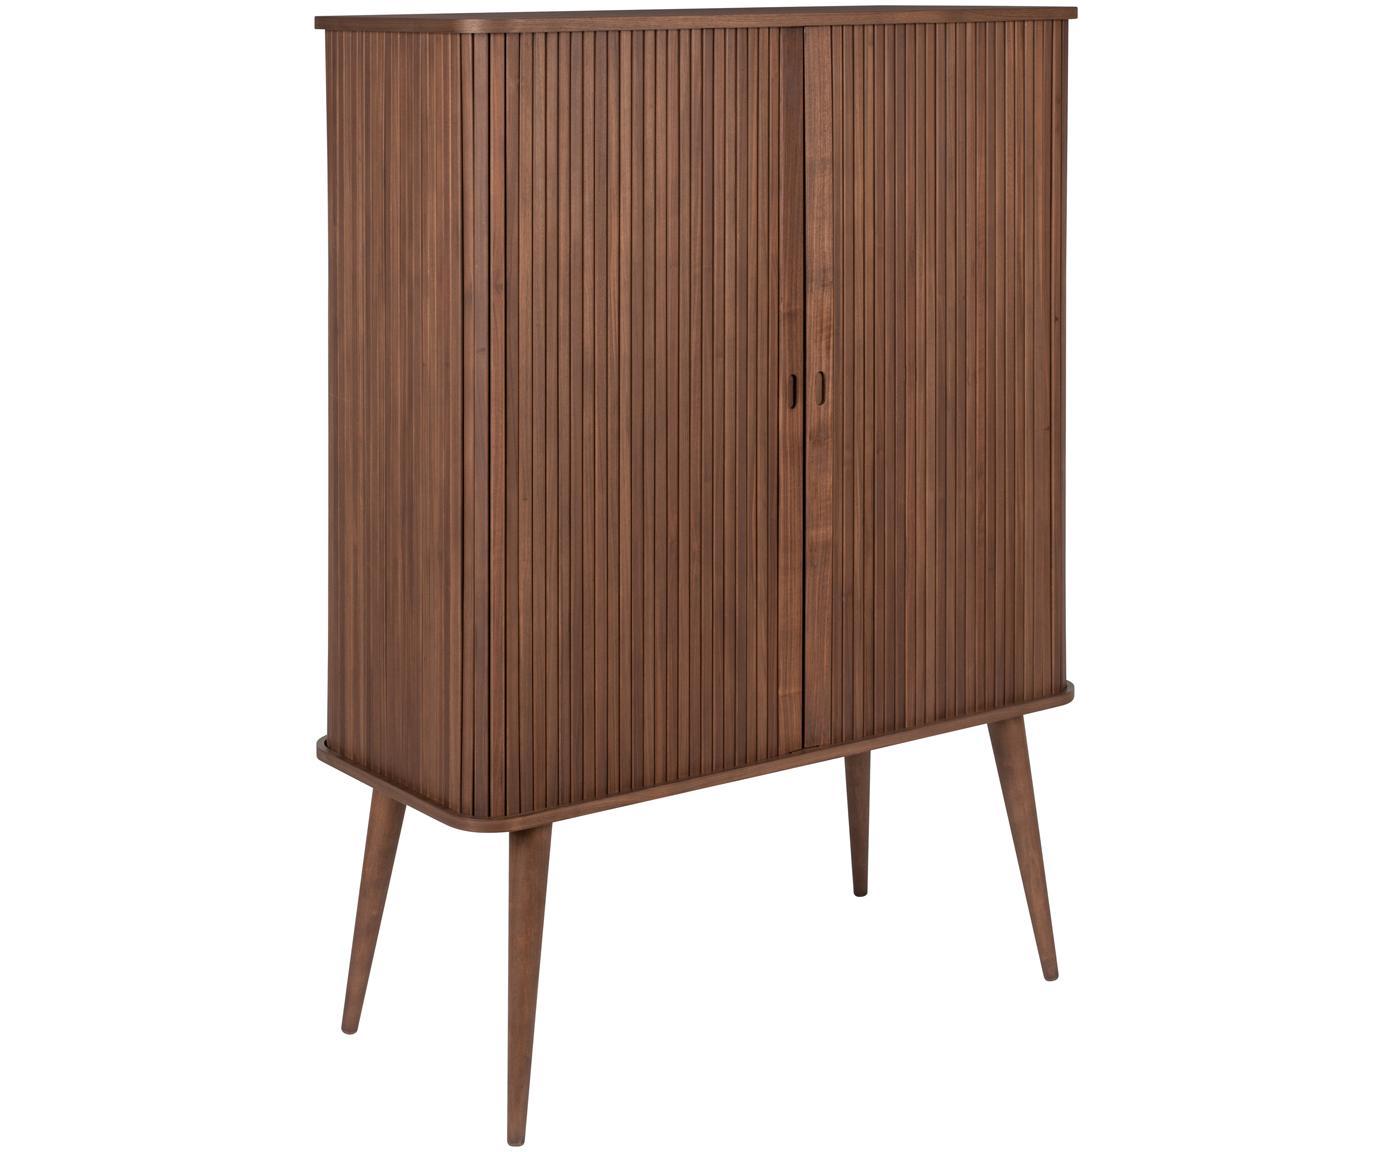 Dressoir Barbier in Retro Design, Frame: MDF, walnoothoutfineer, Plank: hard glas, Walnoothoutkleurig, 100 x 140 cm